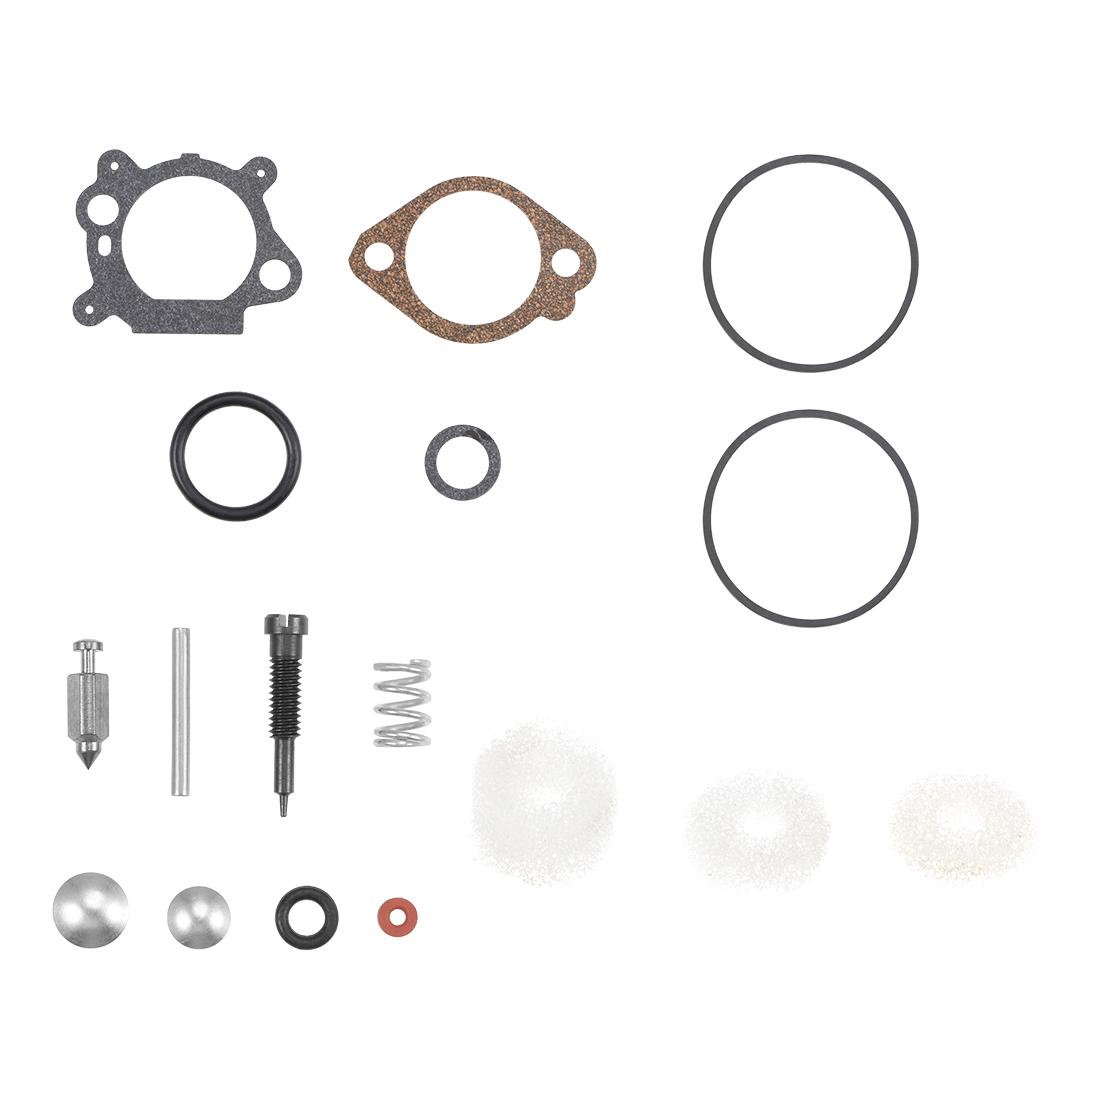 498260 Carburetor Rebuild Kit Gasket Diaphragm for 498260 Carburetor Carb